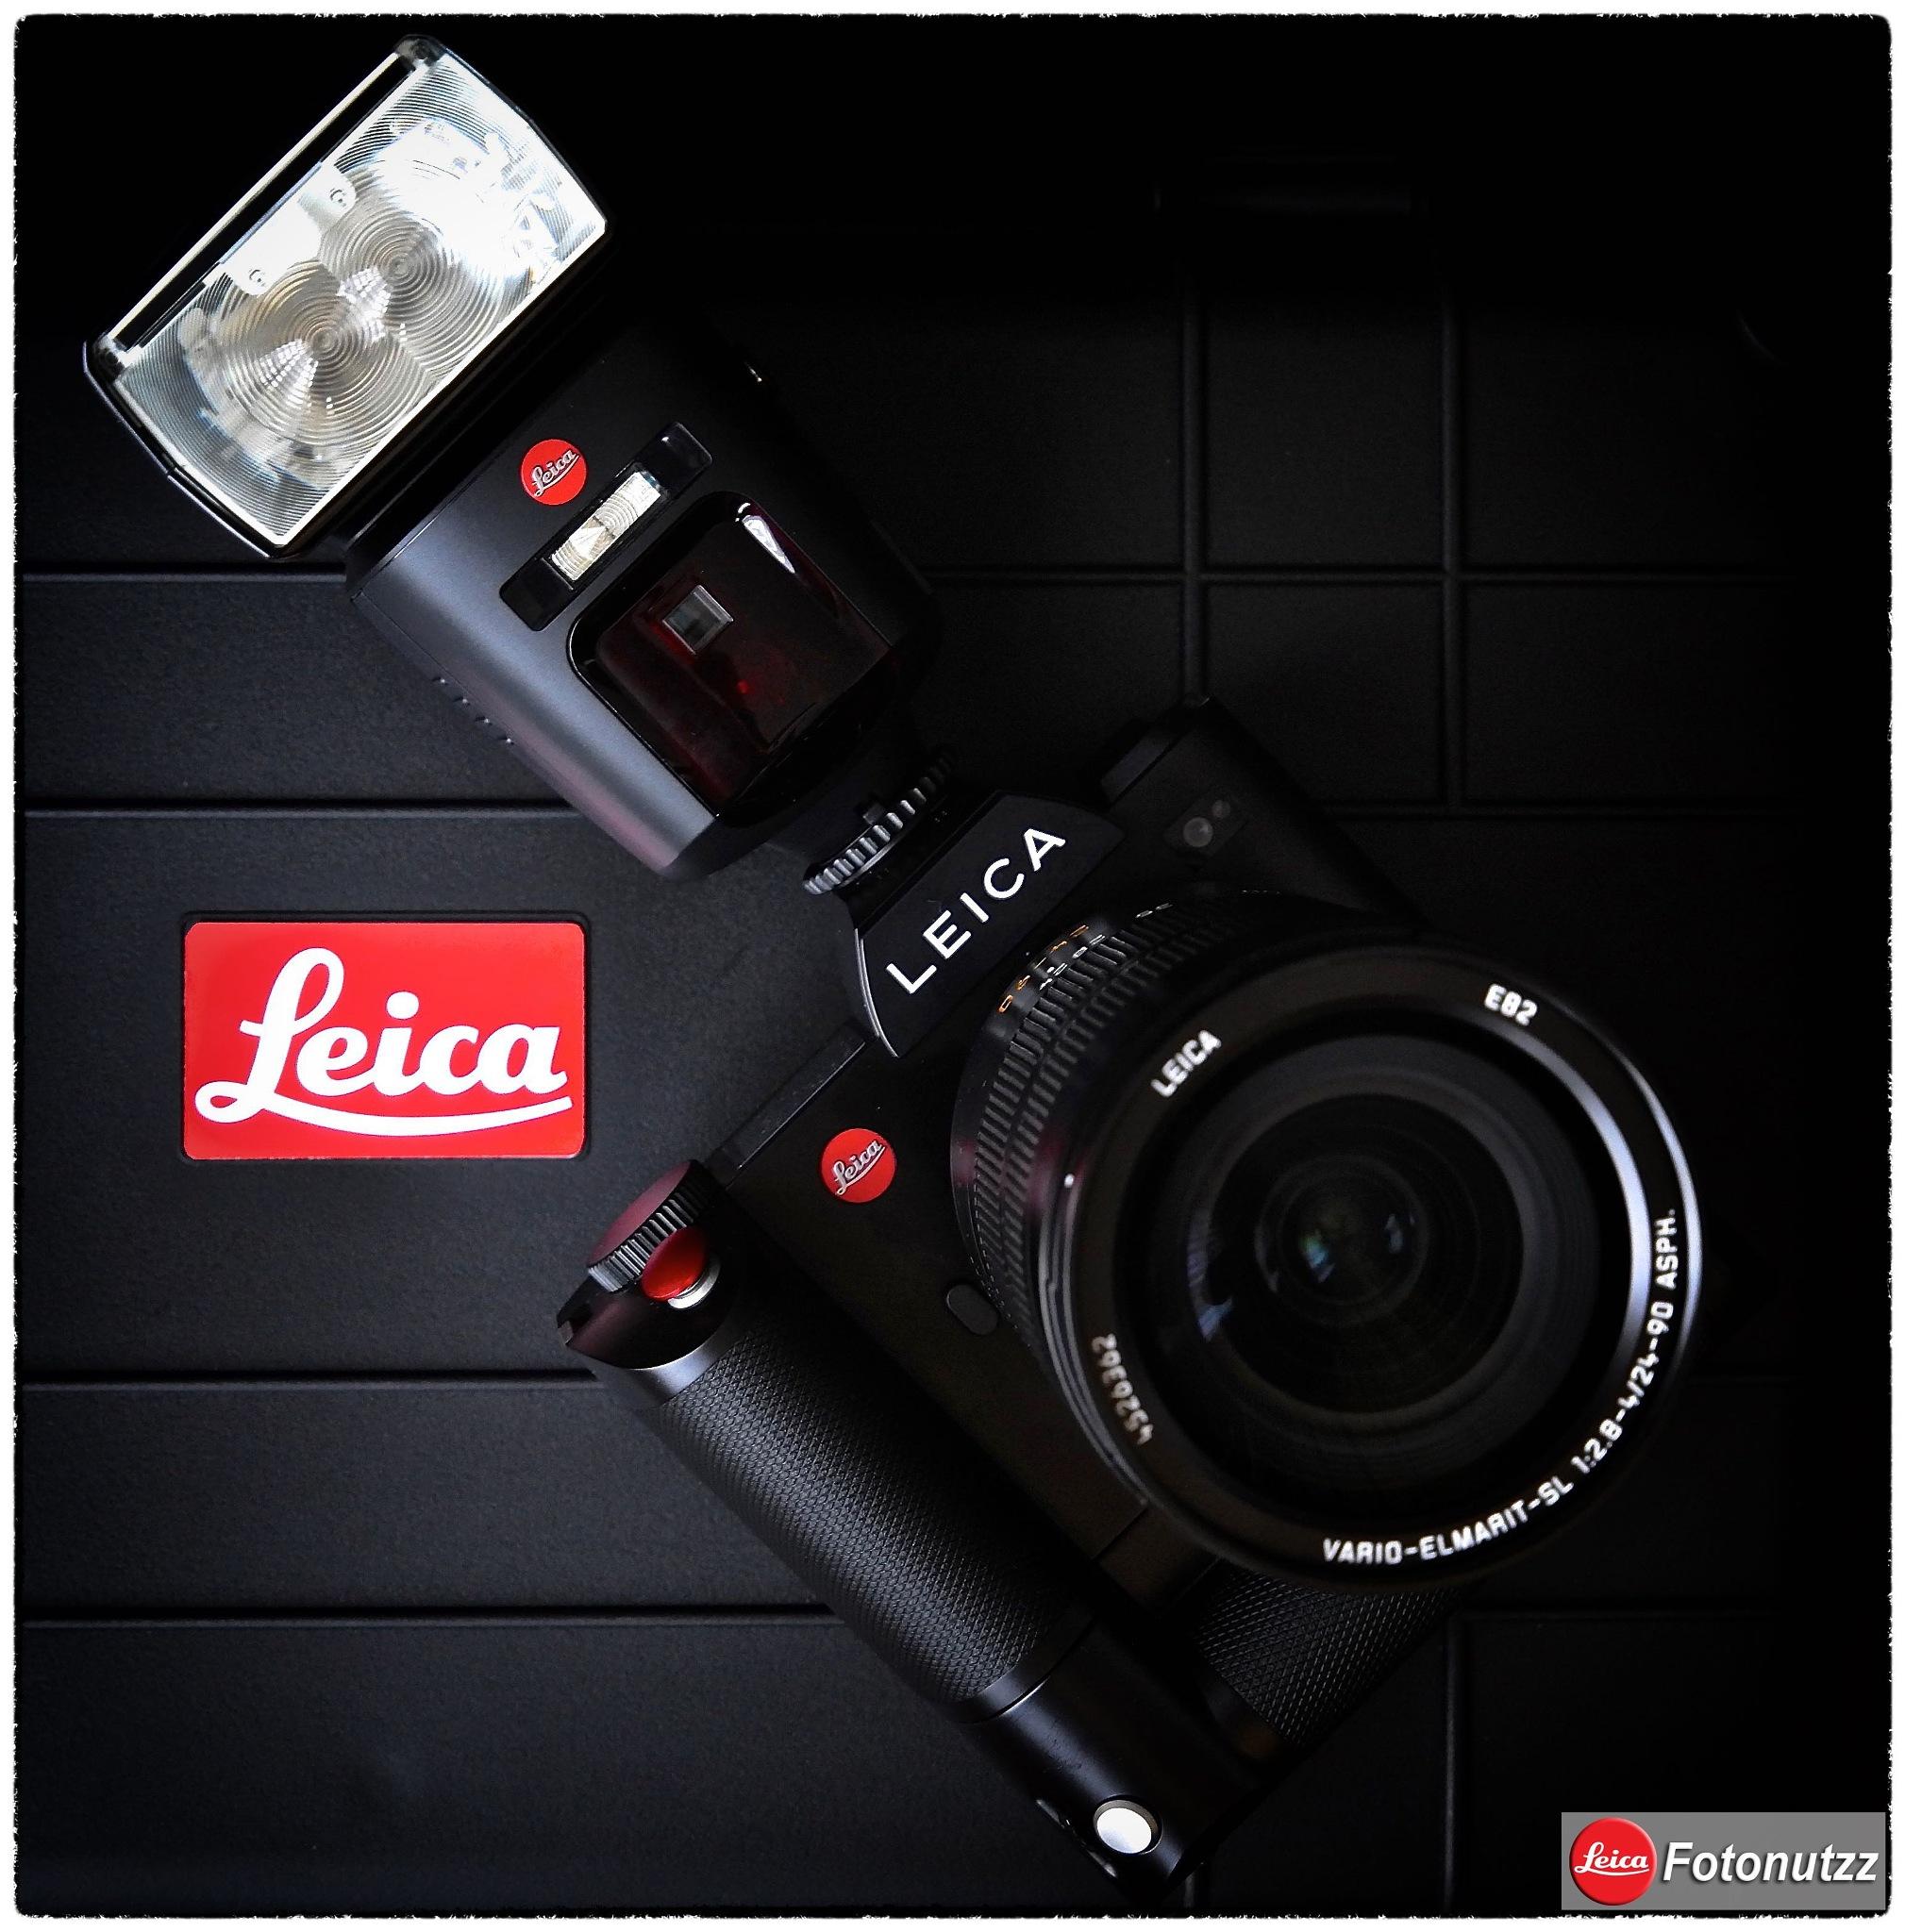 Leica SL by Fotonutzz